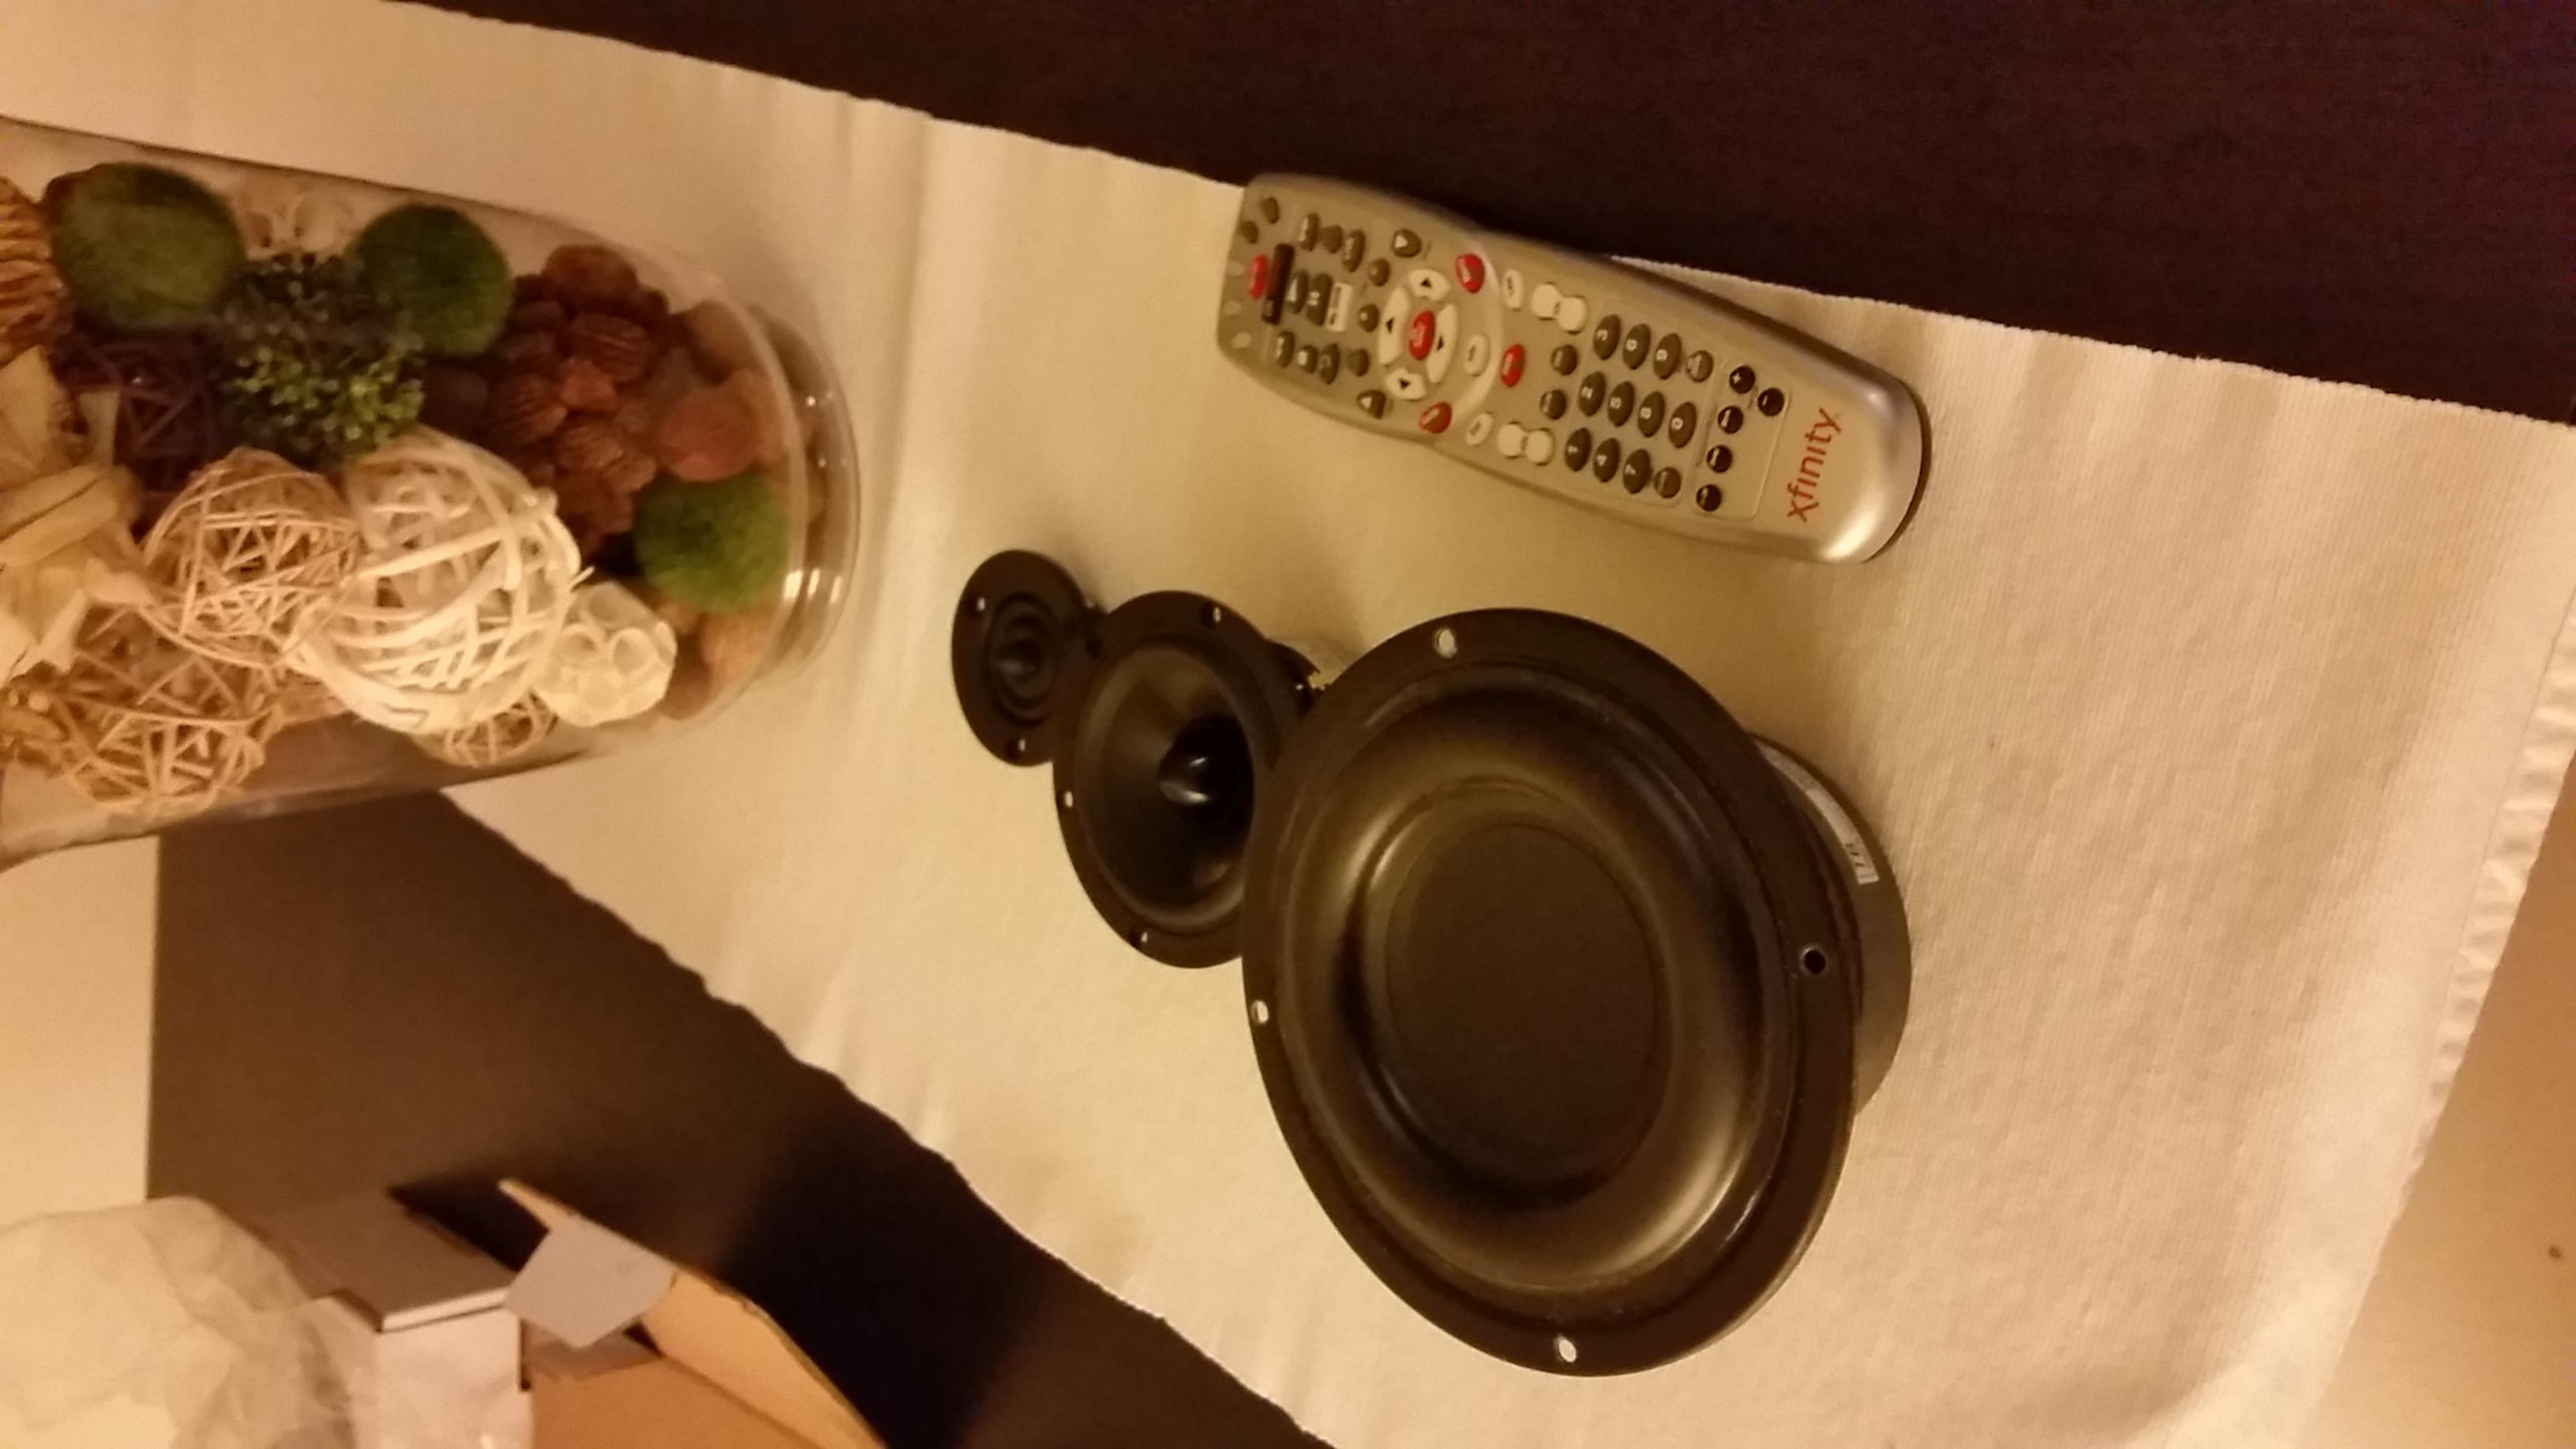 W5-1138smf + rs100-4 + xt25c90-04 - Techtalk Speaker ...